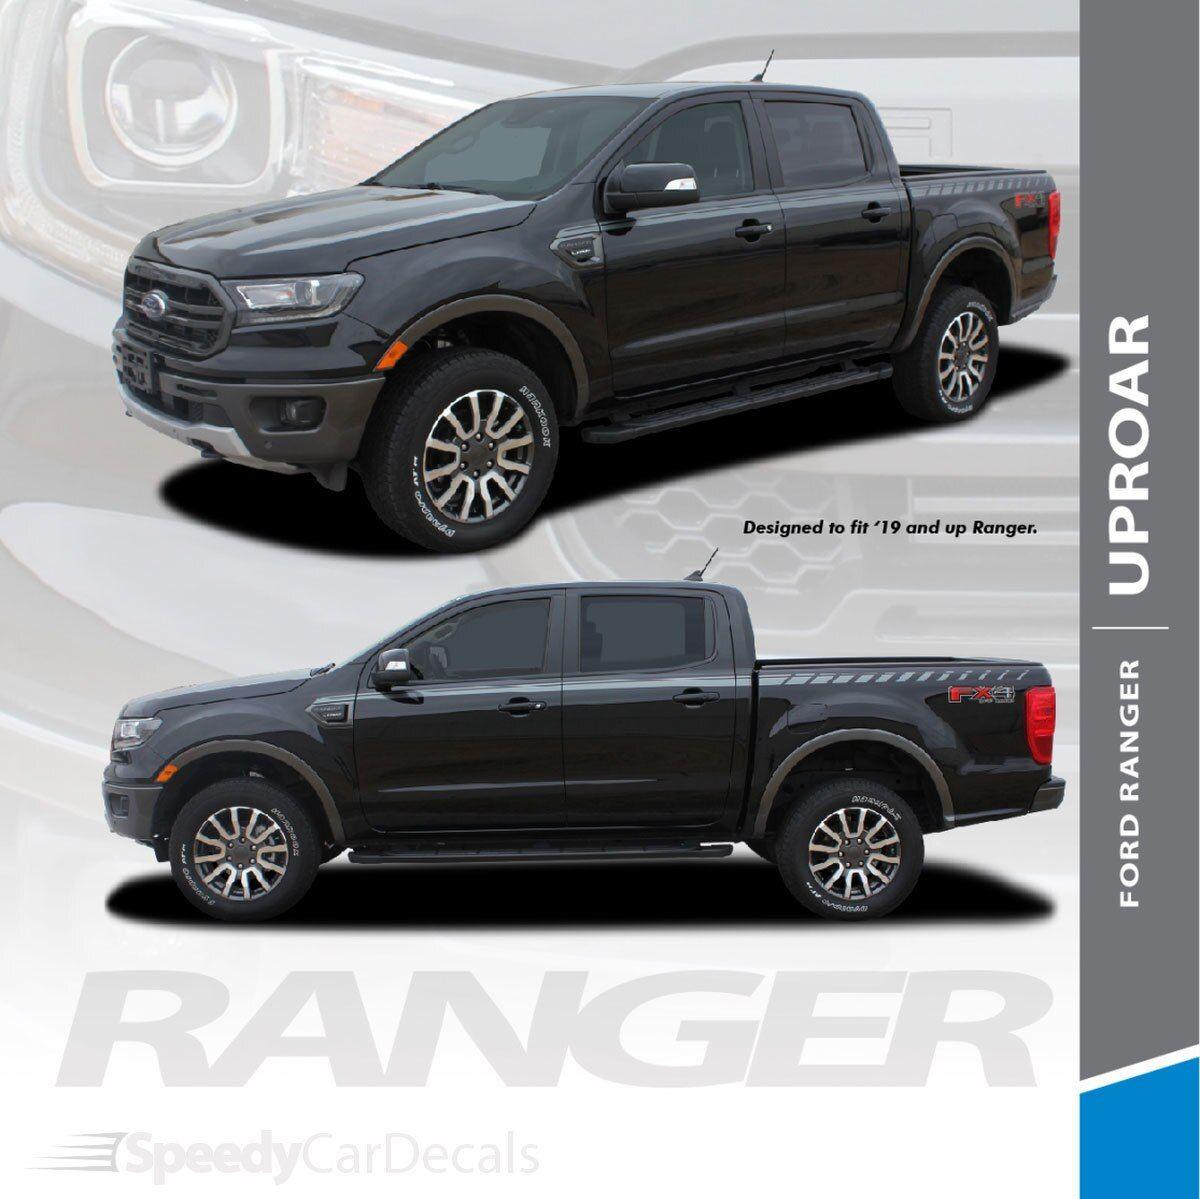 2019 Ford Ranger Stripes UPROAR SIDE DECALS 2020 2019 3M